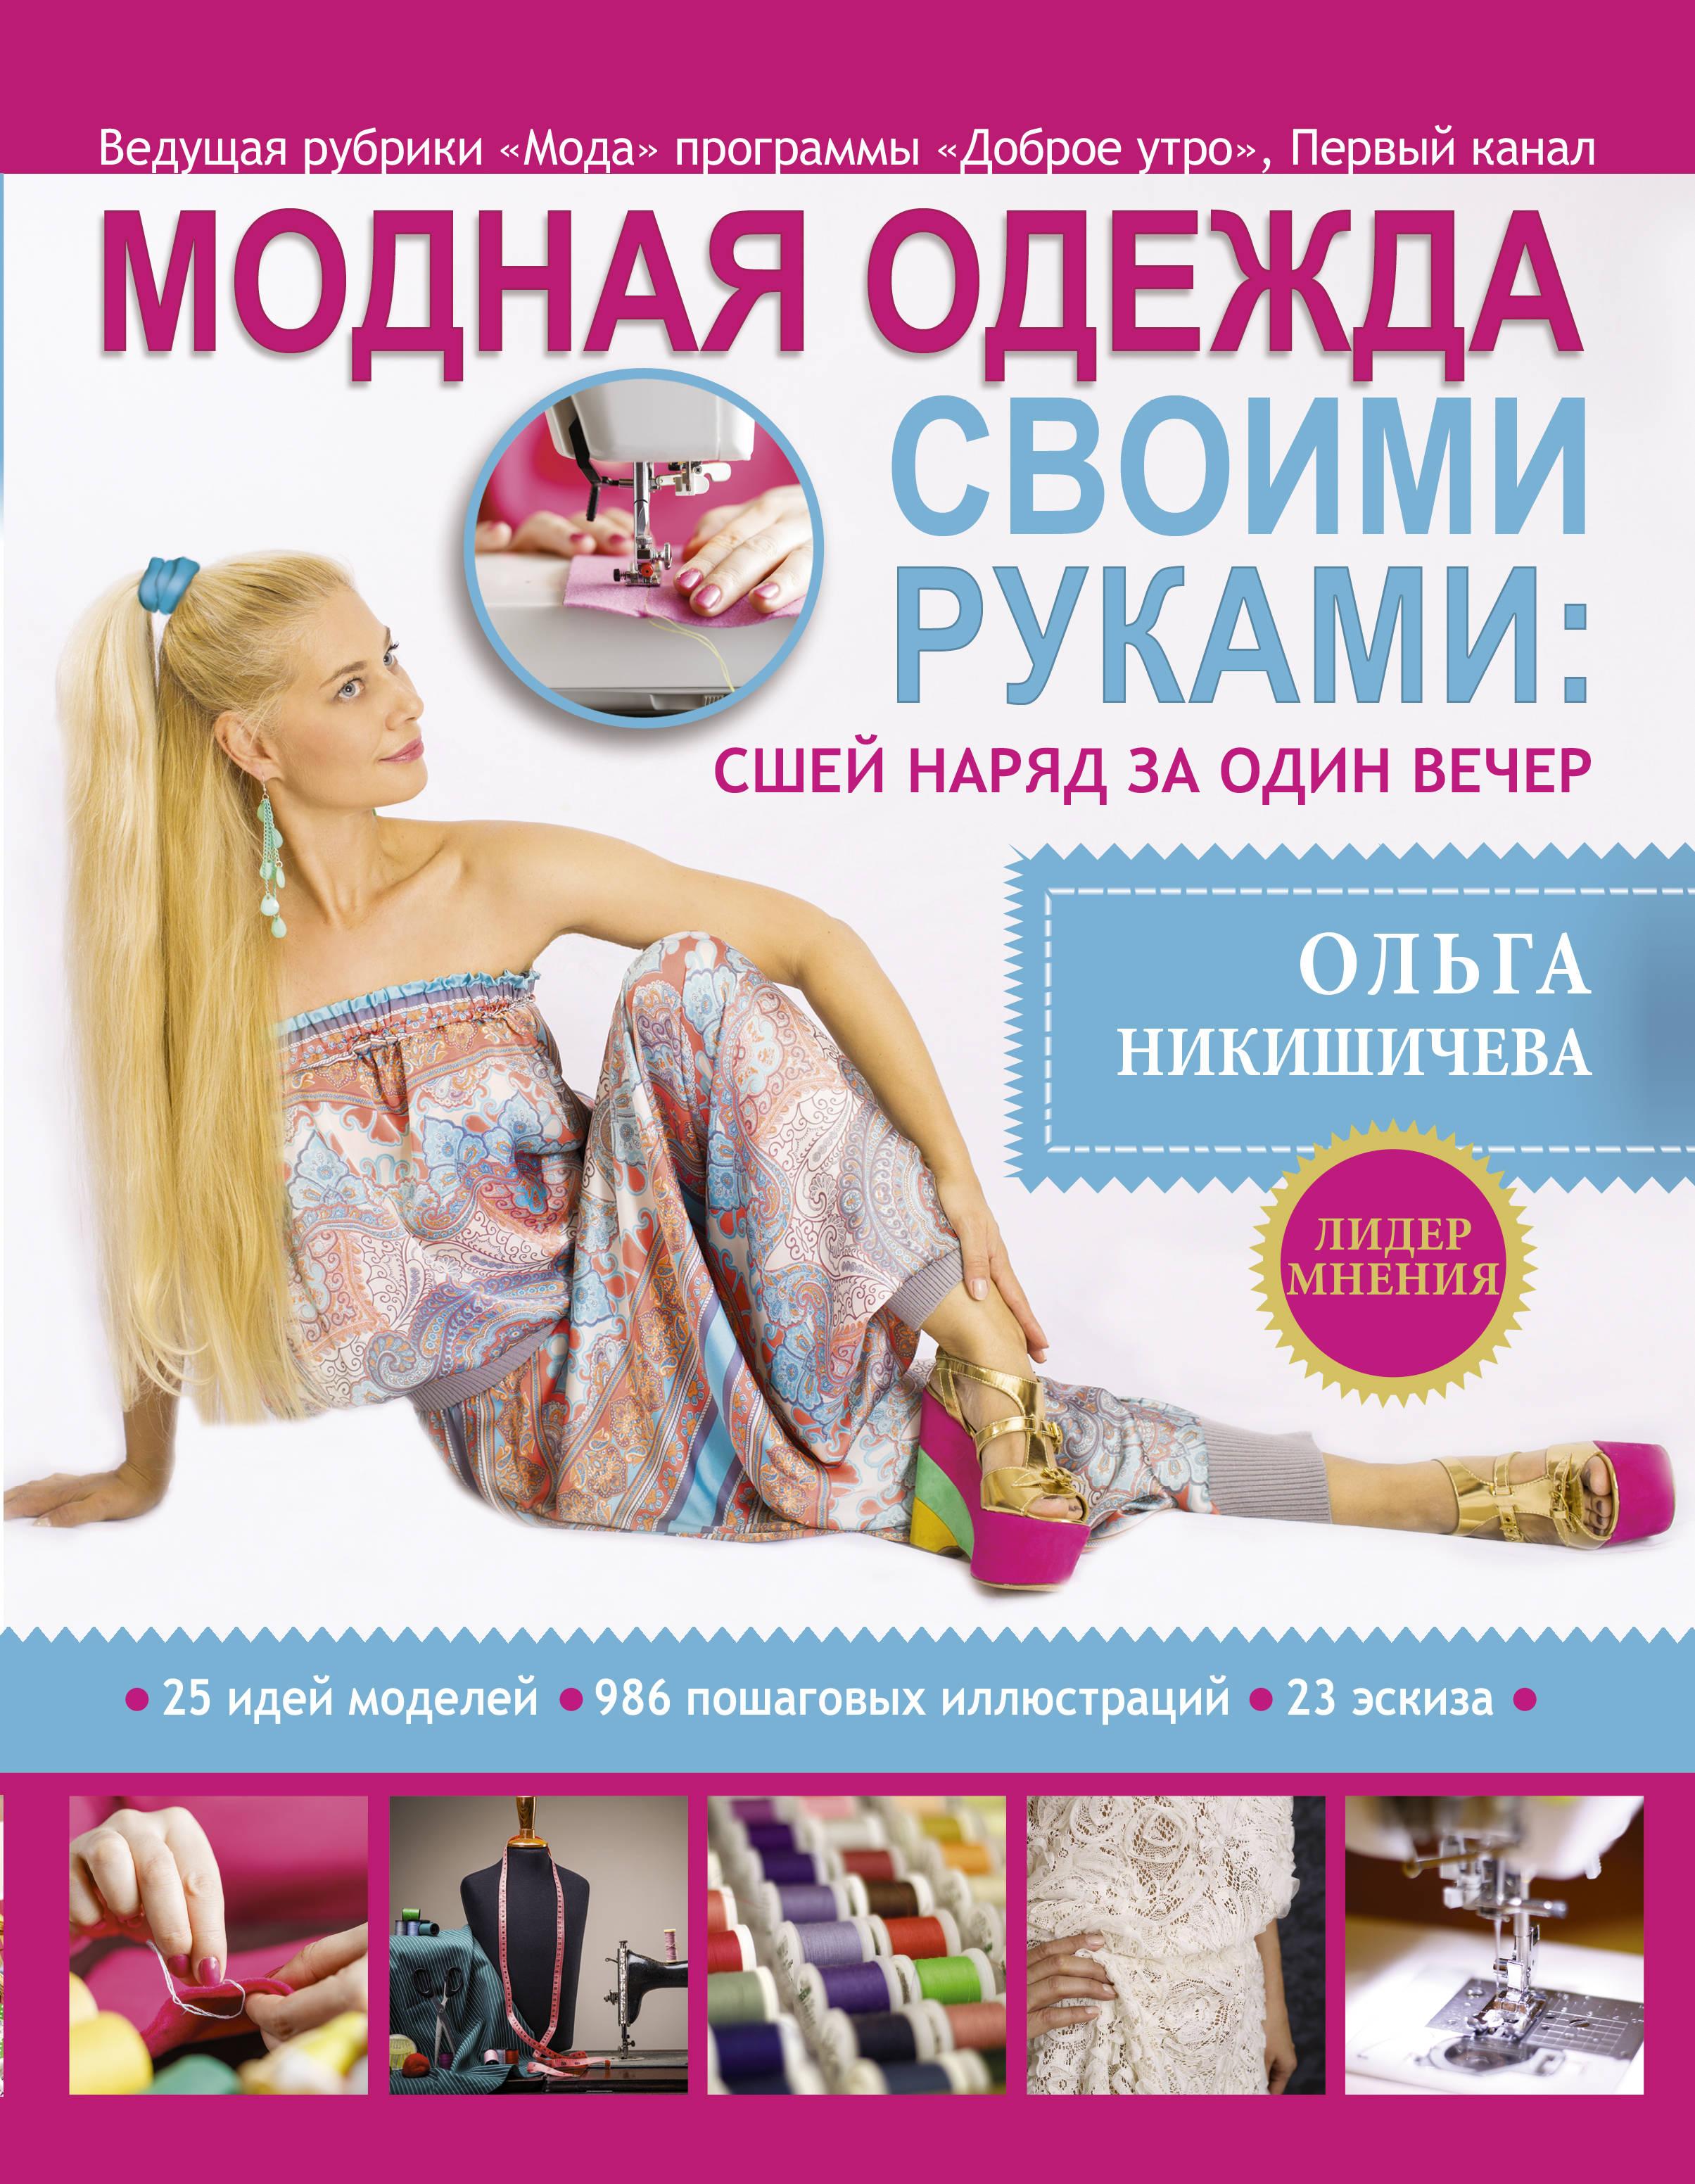 Никишичева О.С. Модная одежда своими руками: сшей наряд за 1 вечер